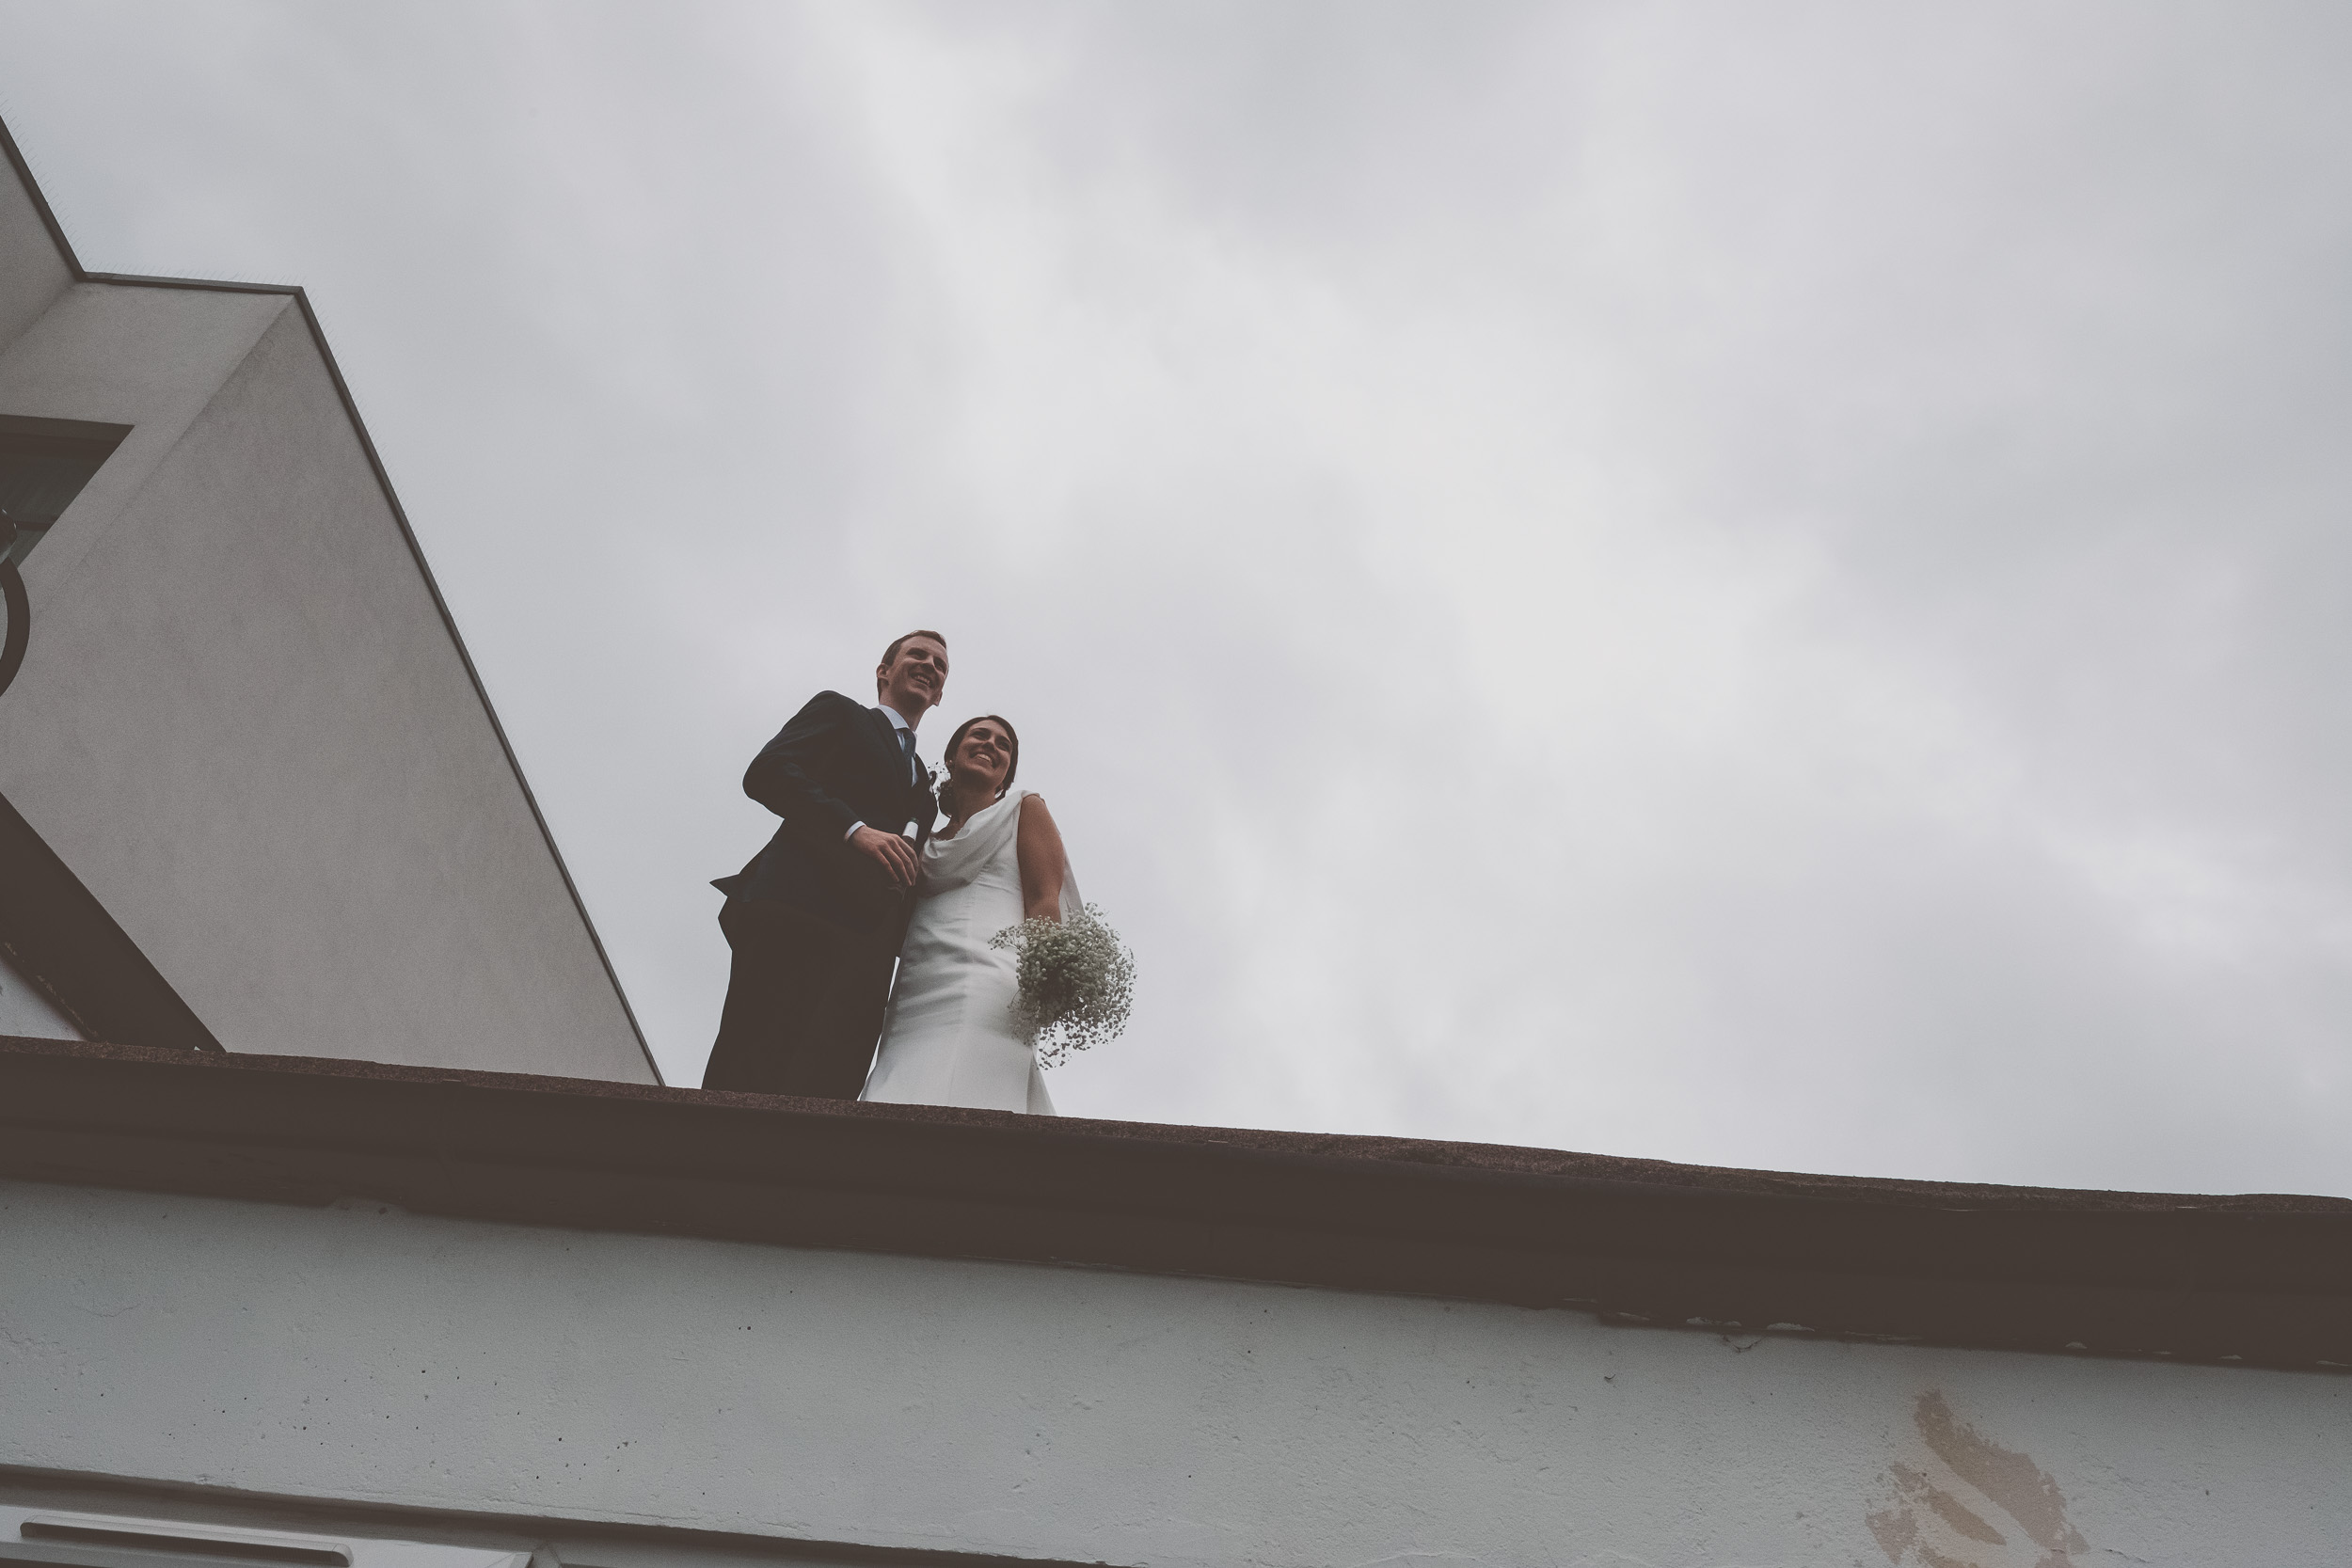 islington-town-hall-4th-floor-studios-wedding246.jpg